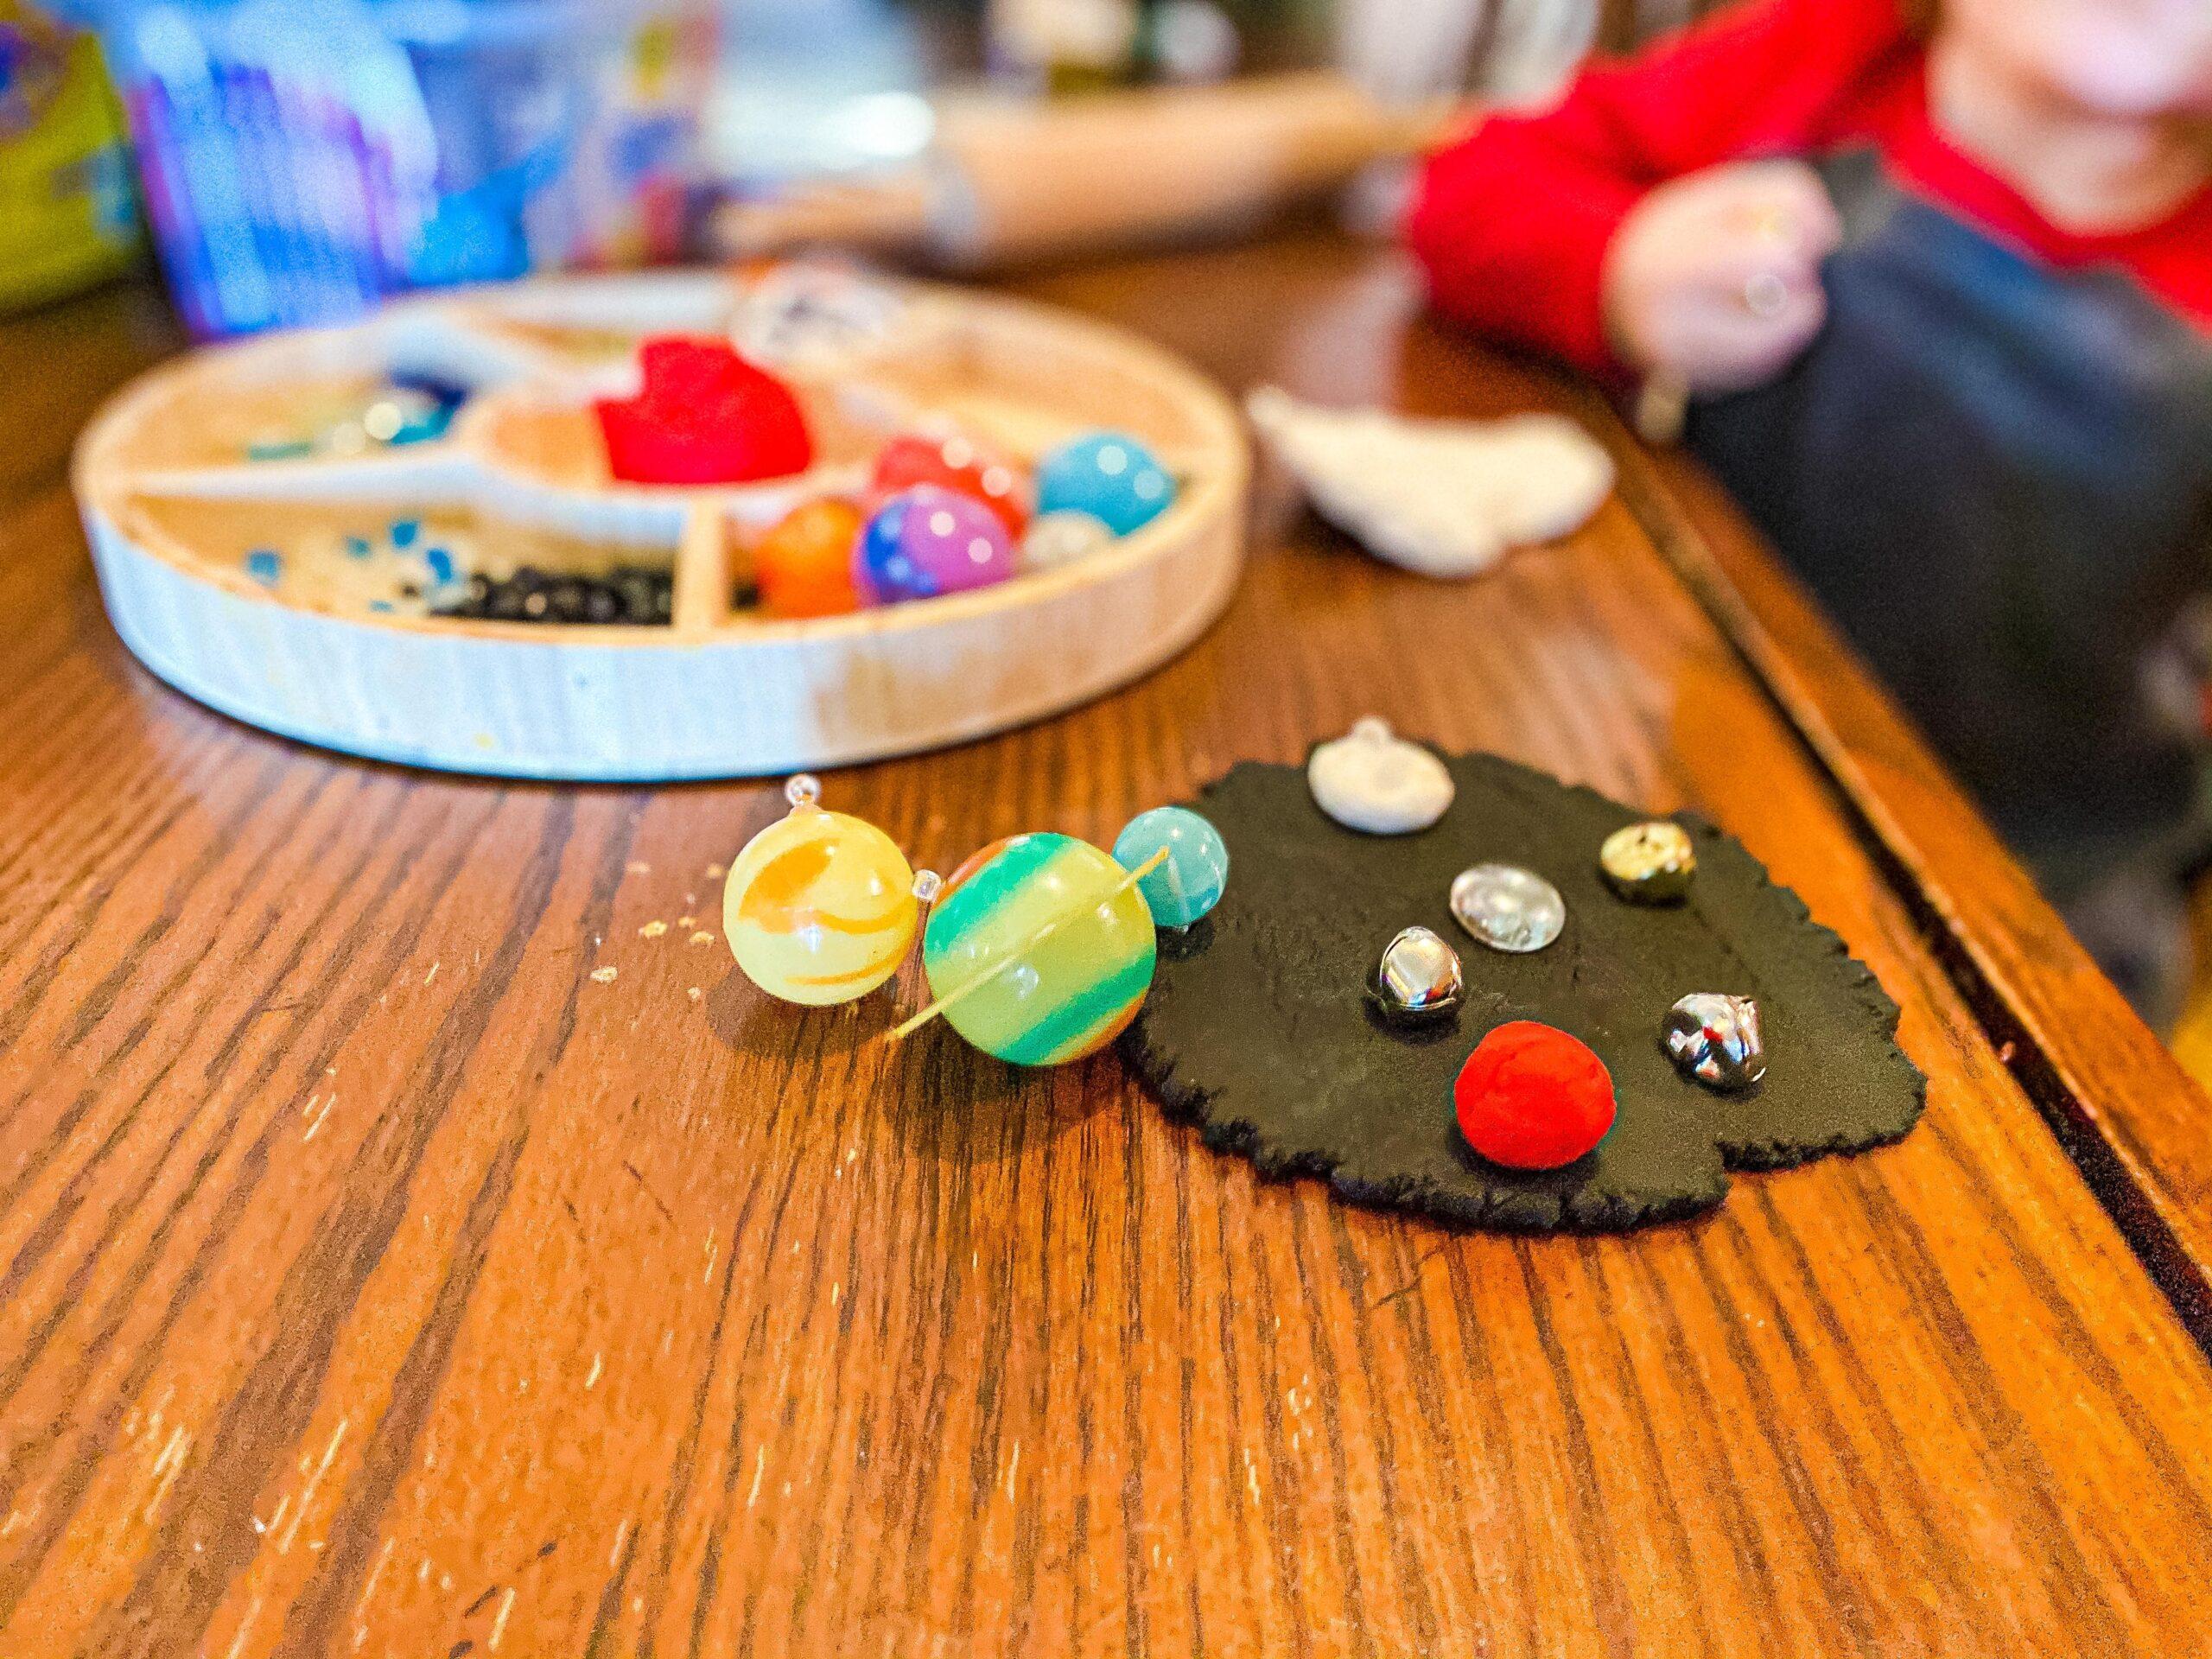 Space Playdough Invitation to Play Tray